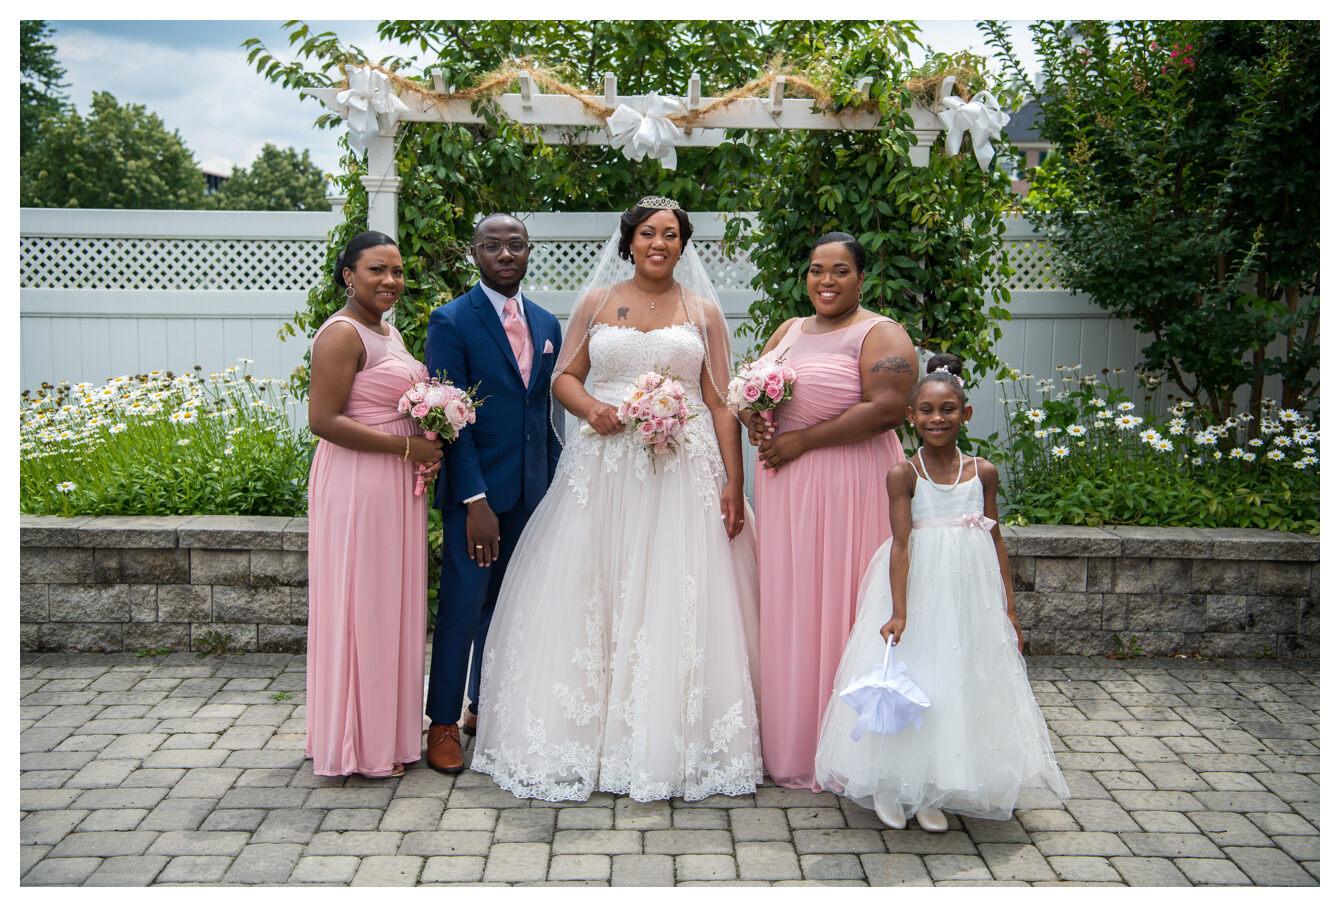 woods_wedding_kevkramerphoto_web-6.jpg